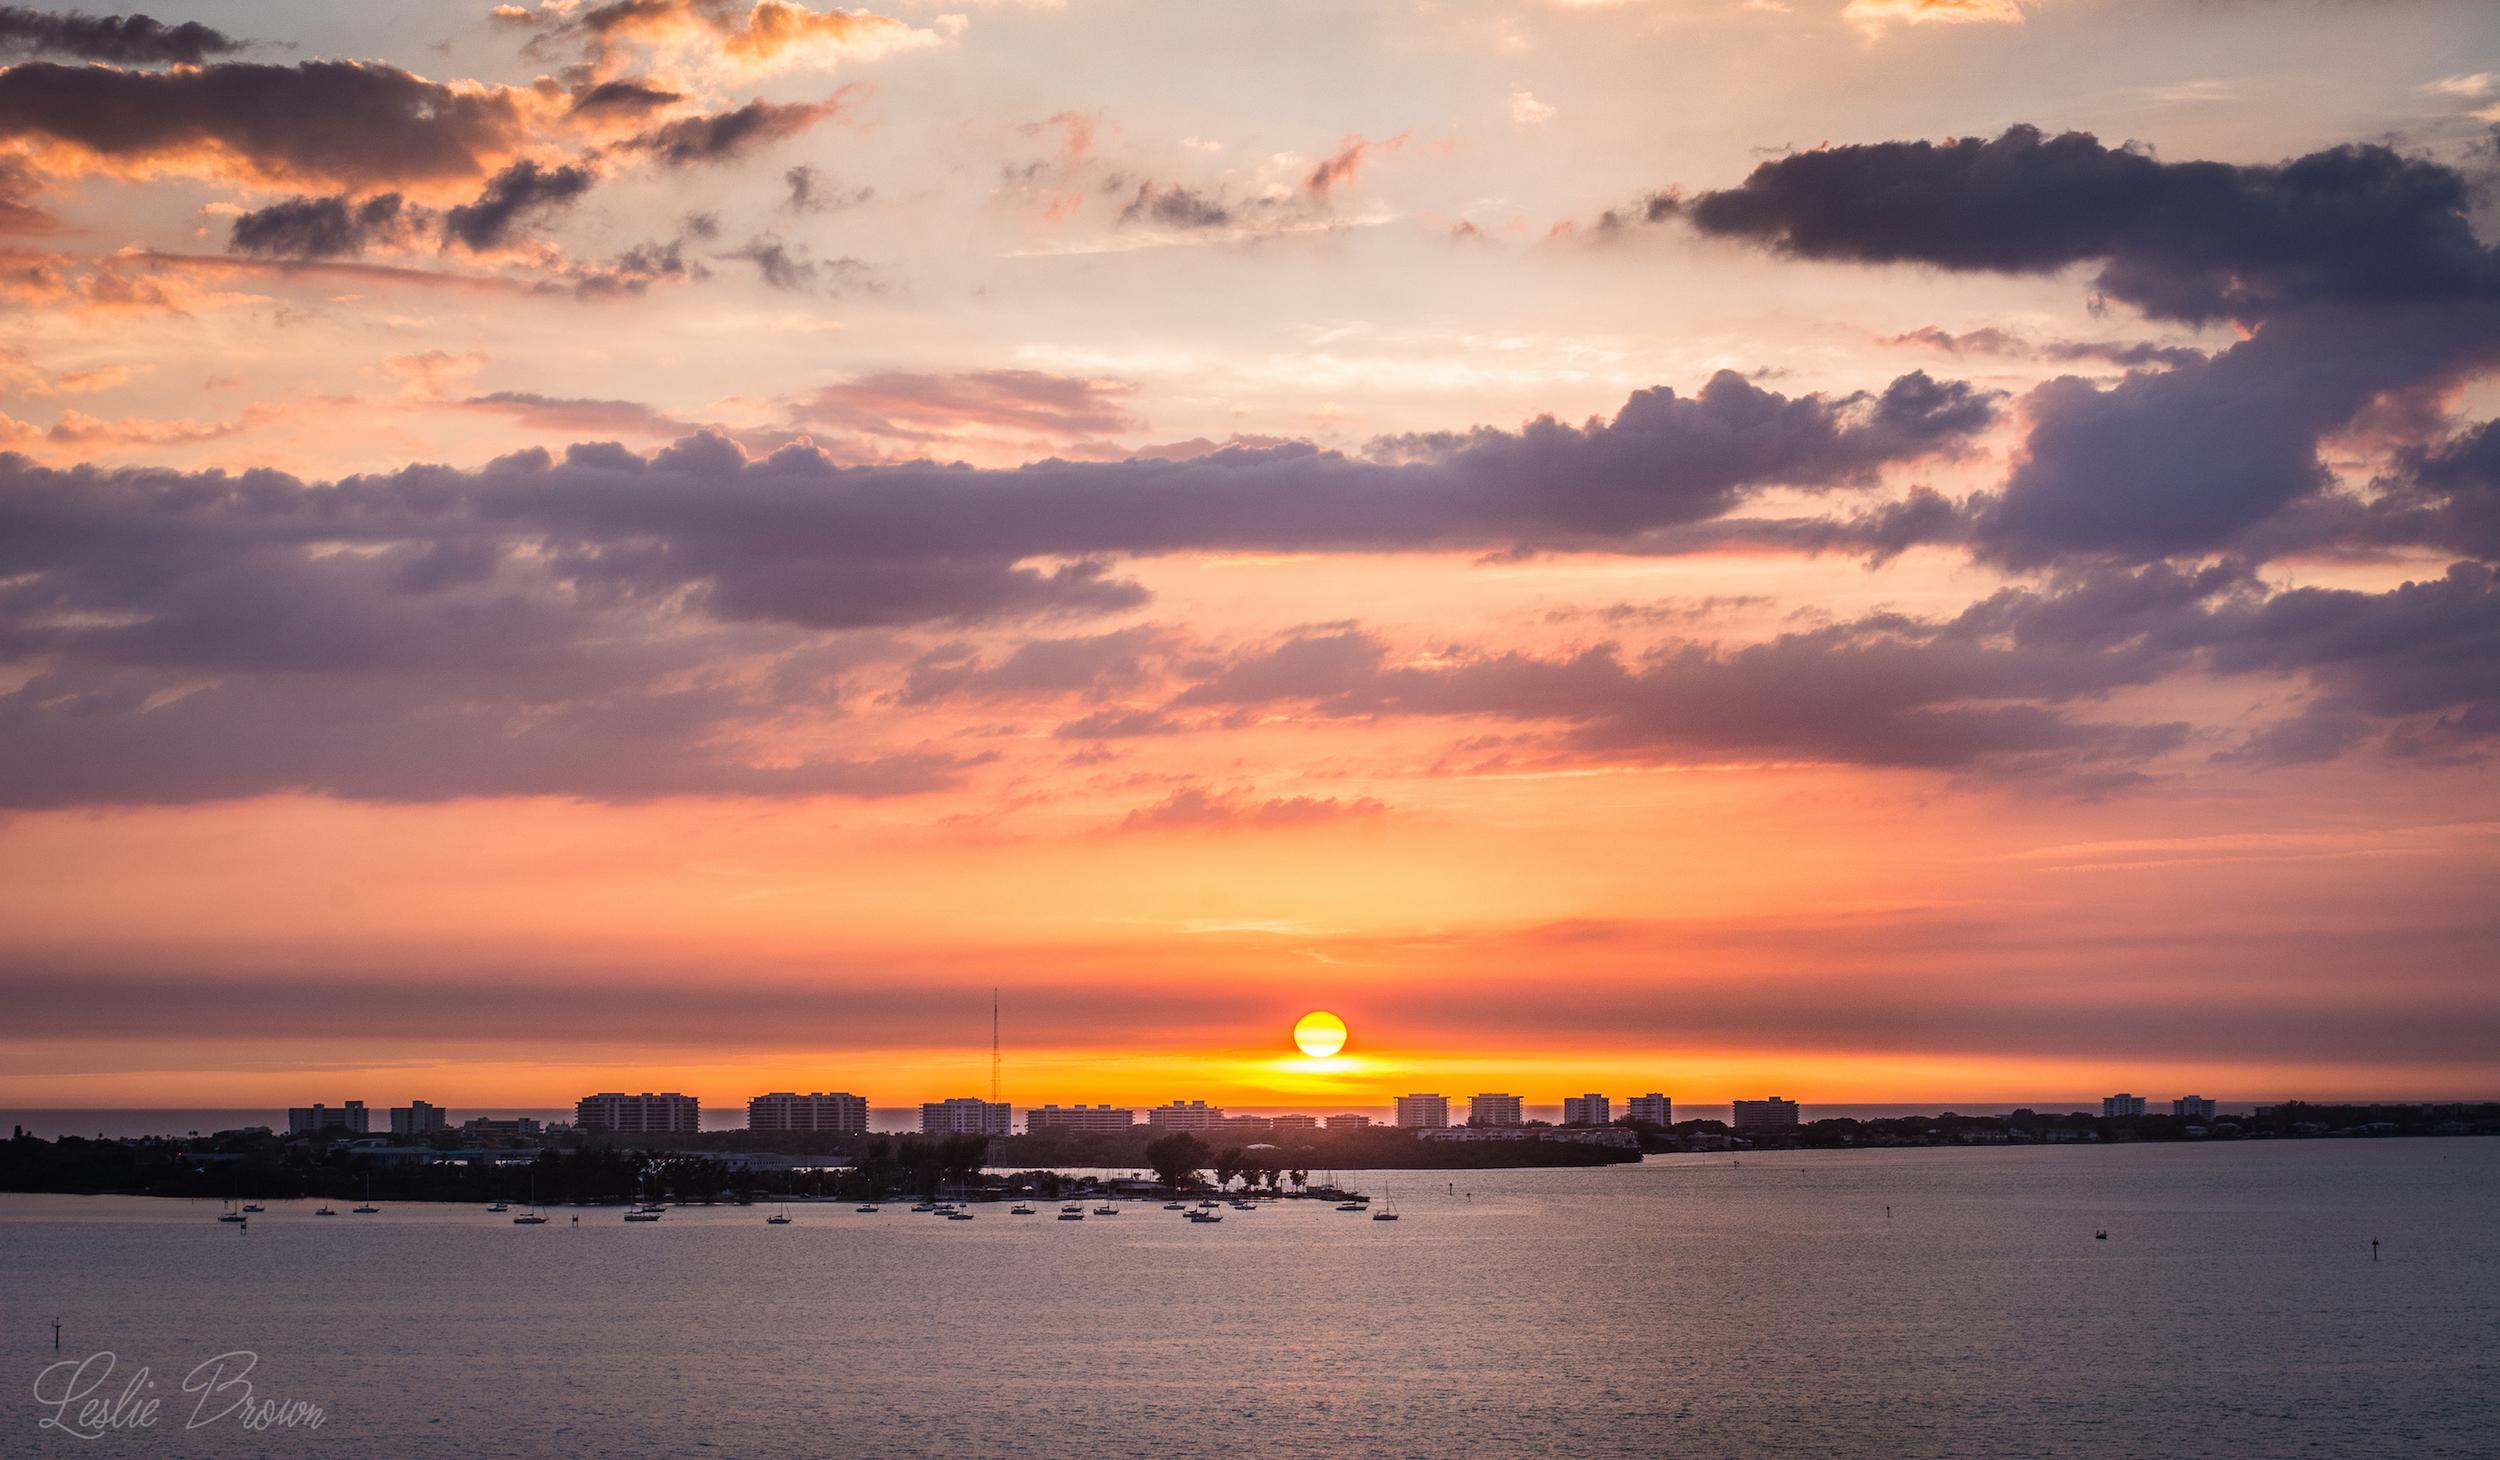 Veiled Sunset - Leslie Brown